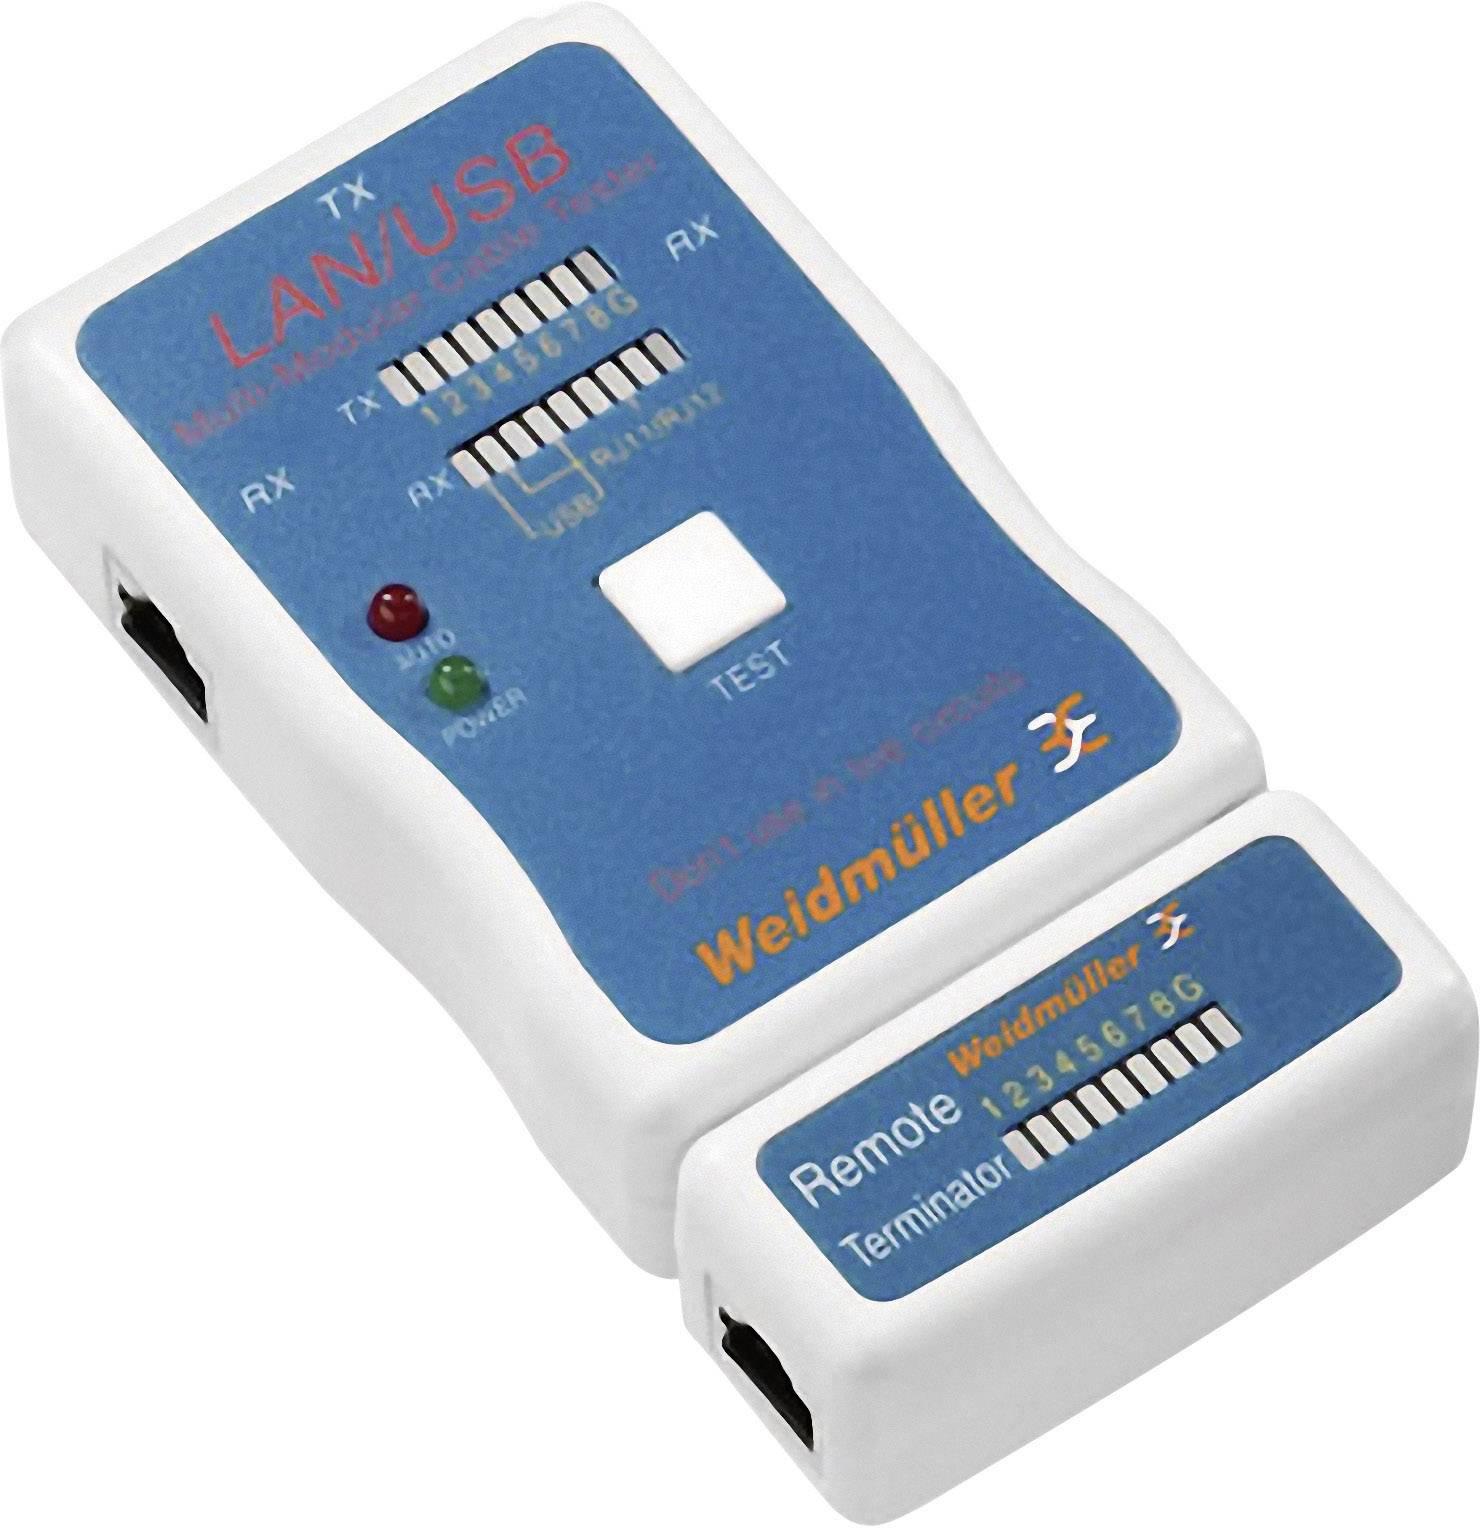 Weidmüller LAN USB TESTER LAN, USB